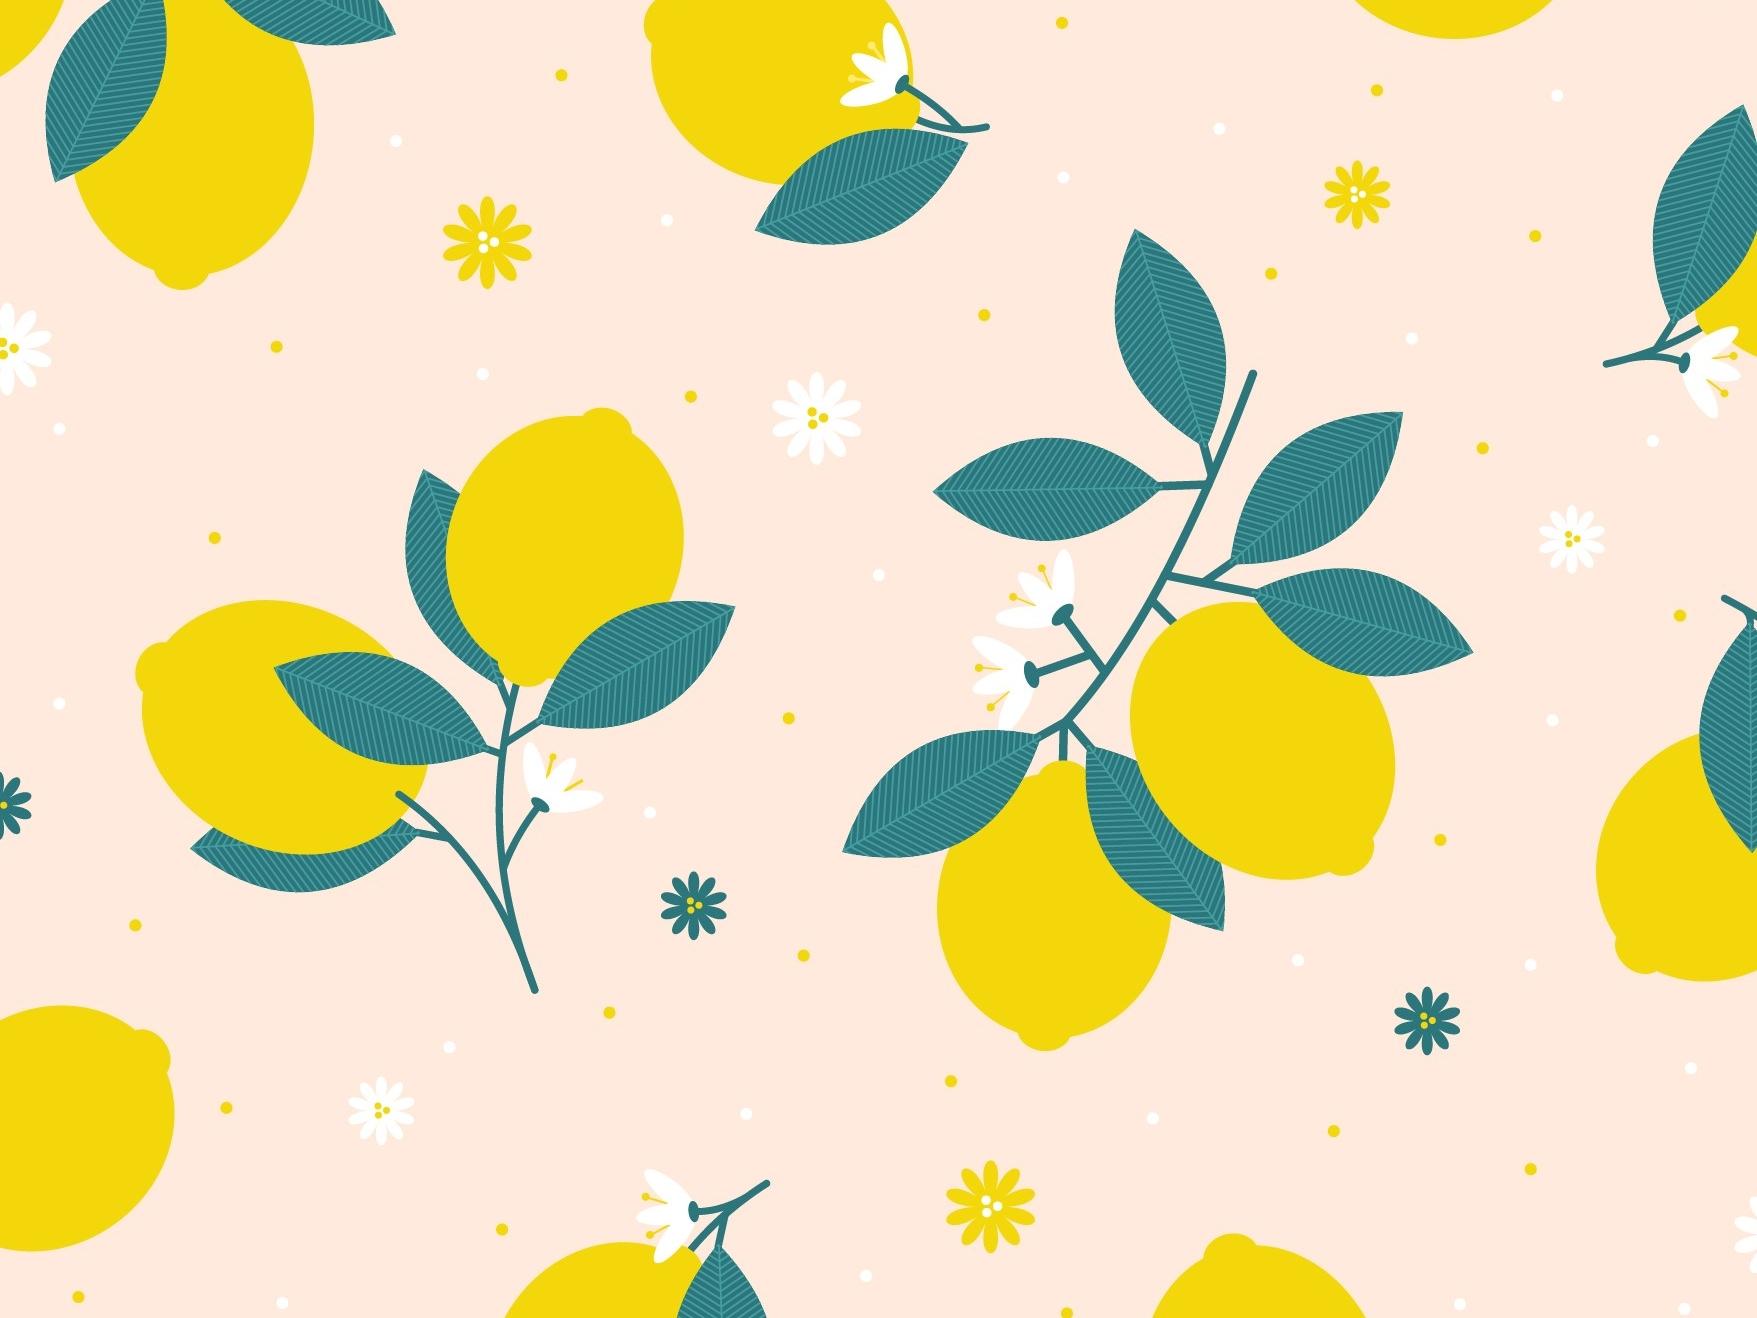 Lemon Print By Megstyles On Dribbble